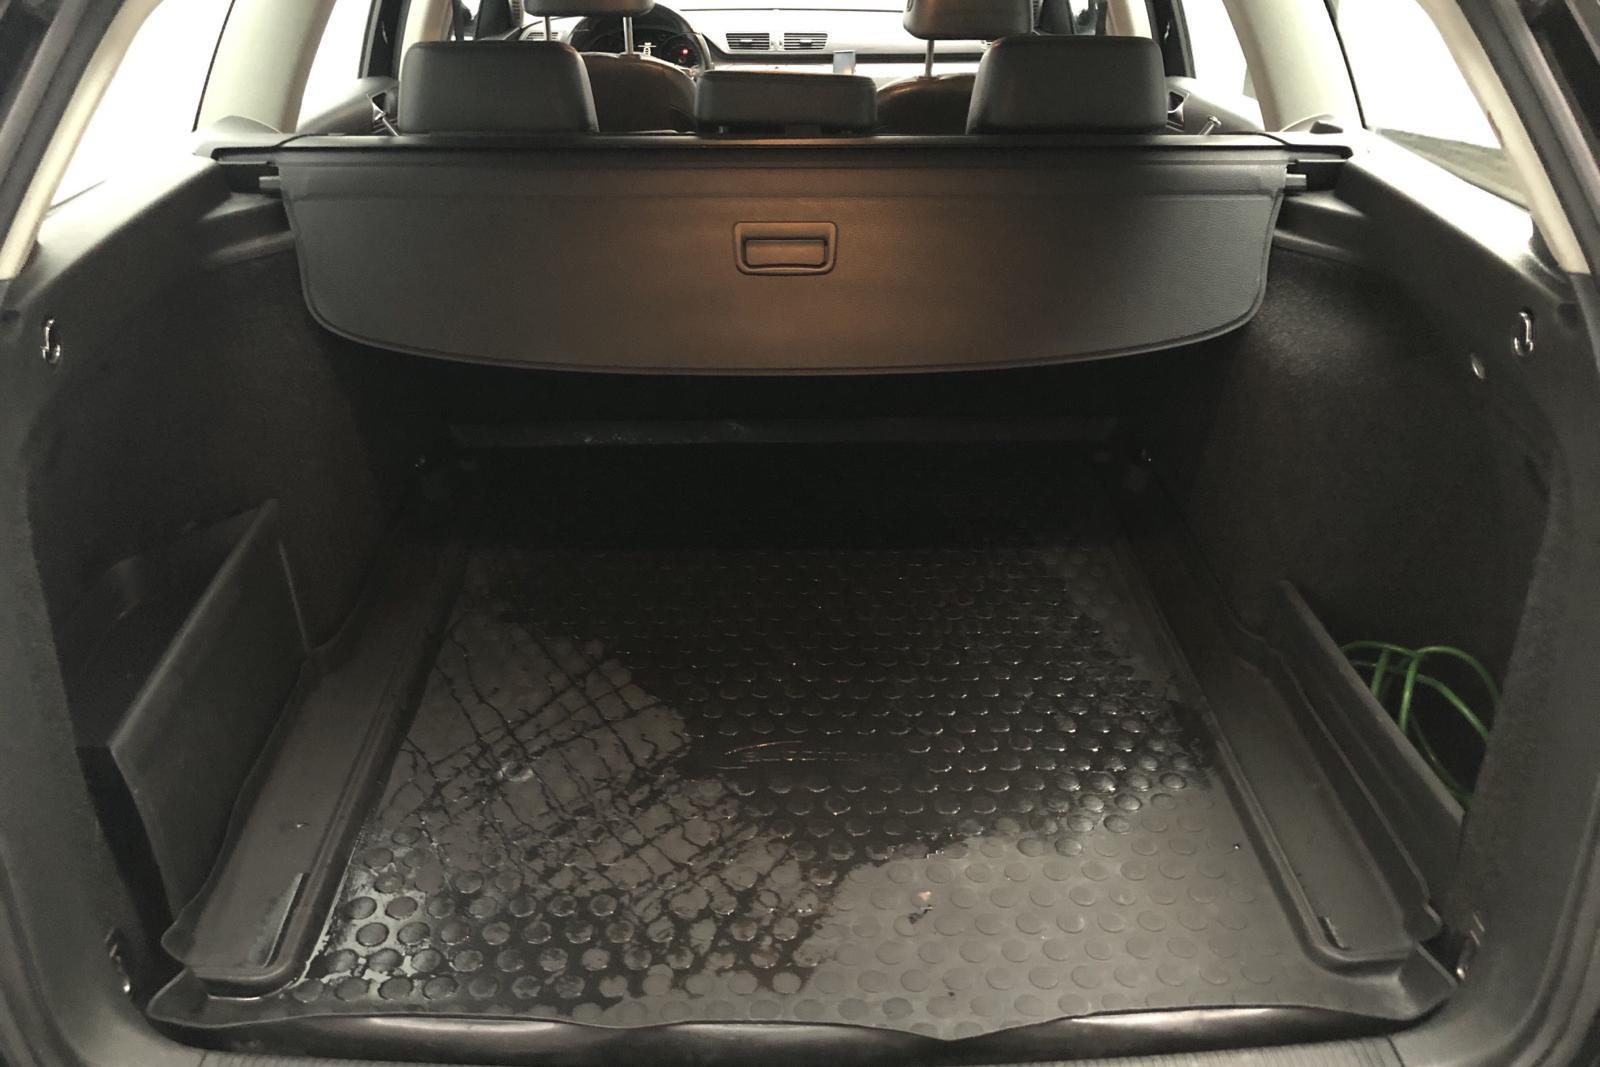 VW Passat 1.4 TSI EcoFuel Variant (150hk) - 15 600 mil - Automat - svart - 2010